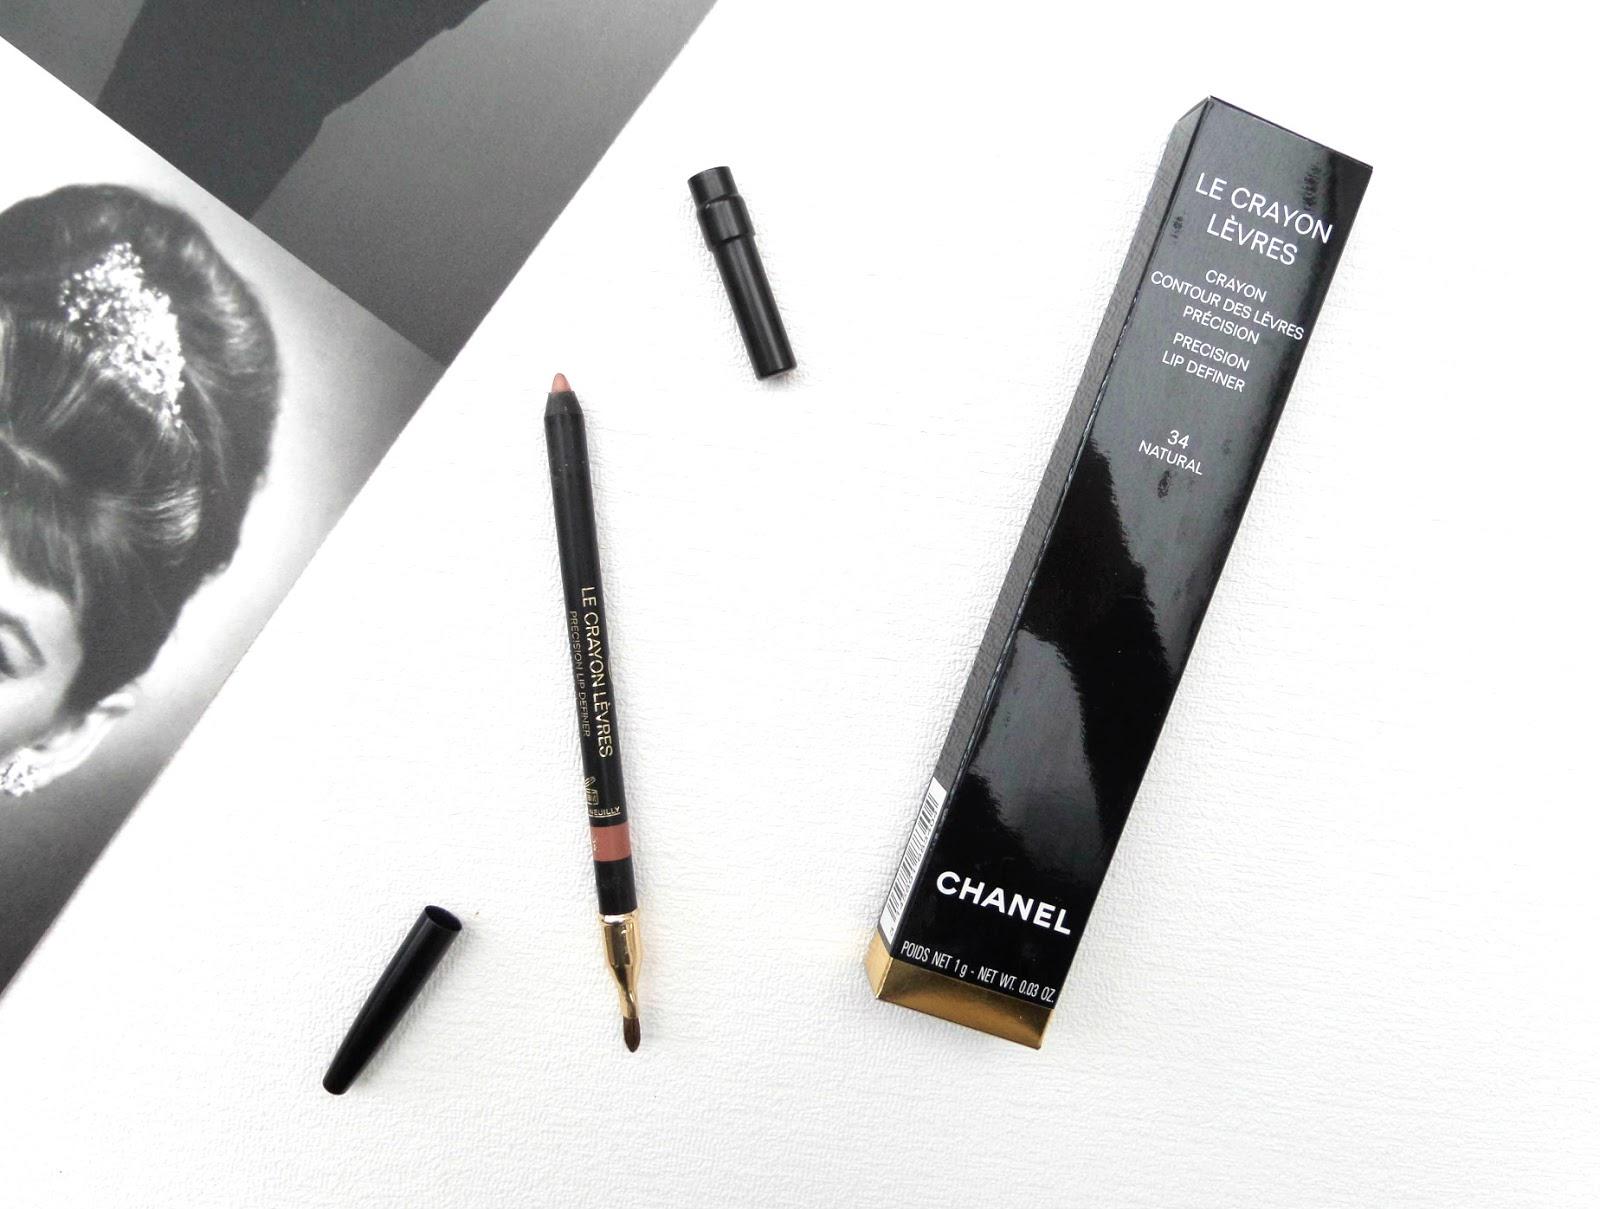 The Chanel Le Crayon Levres, the Precision Lip Definer in 34